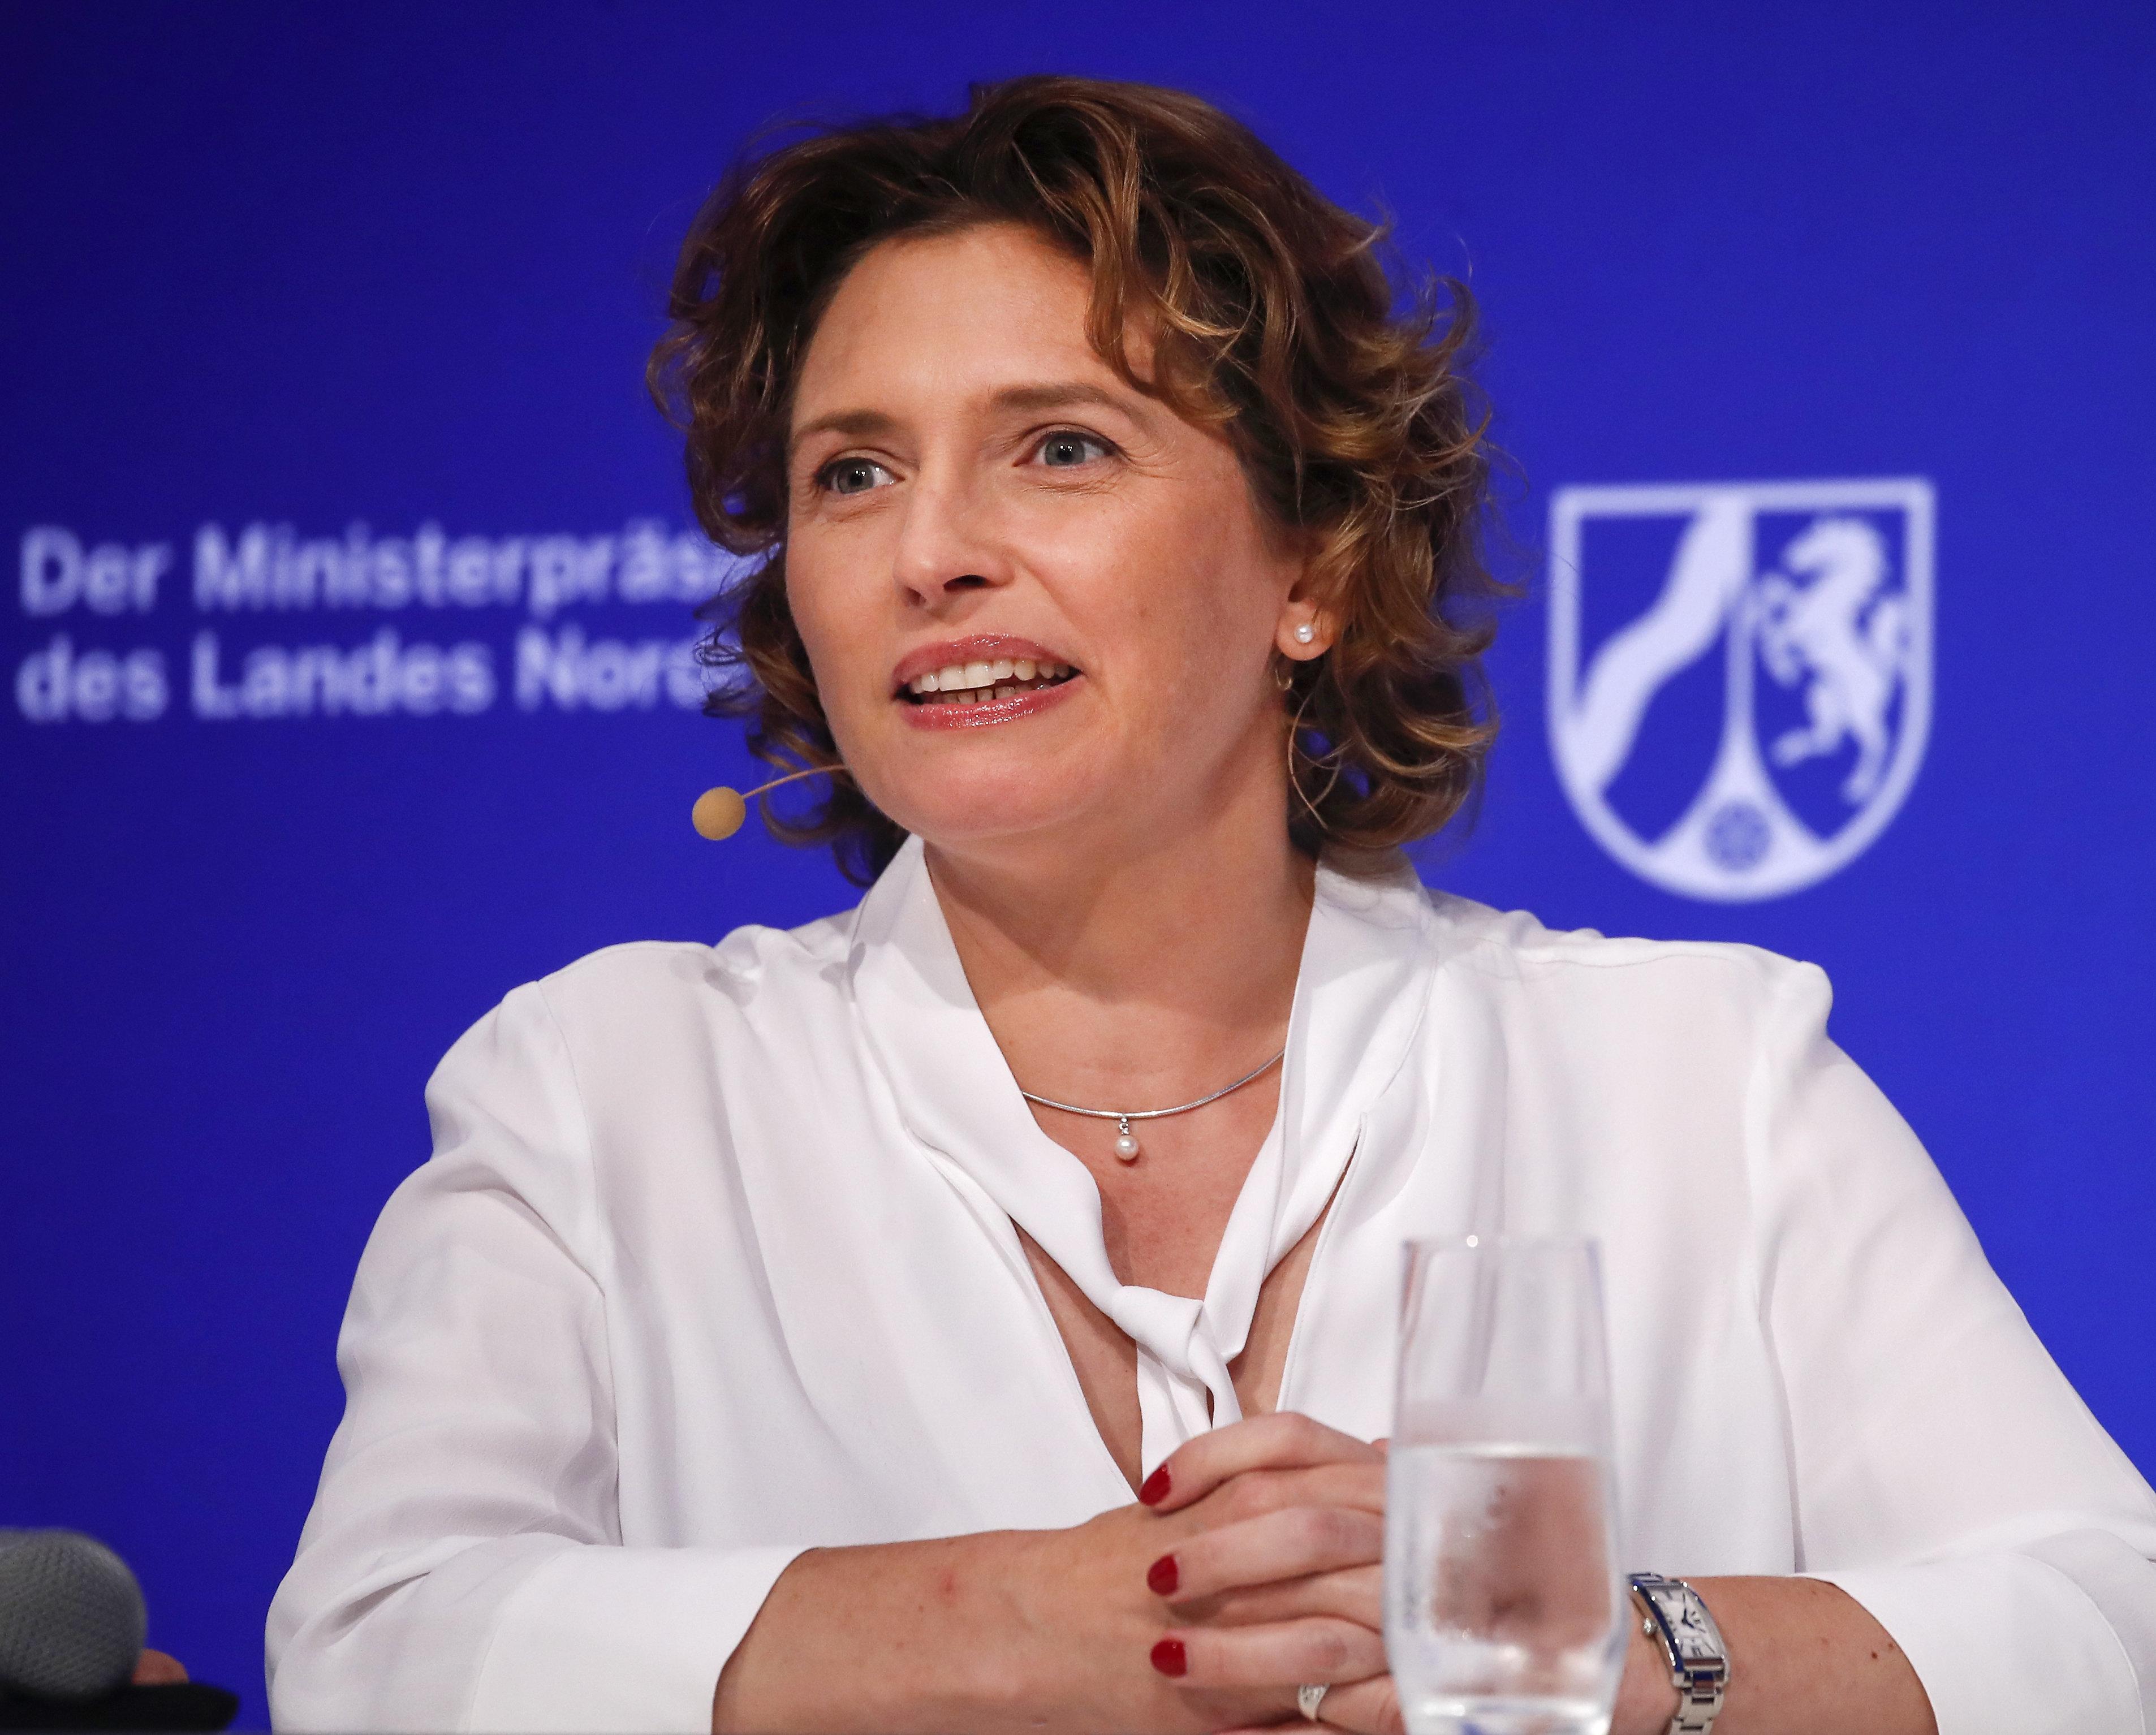 Europawahl-Kandidatin Beer: